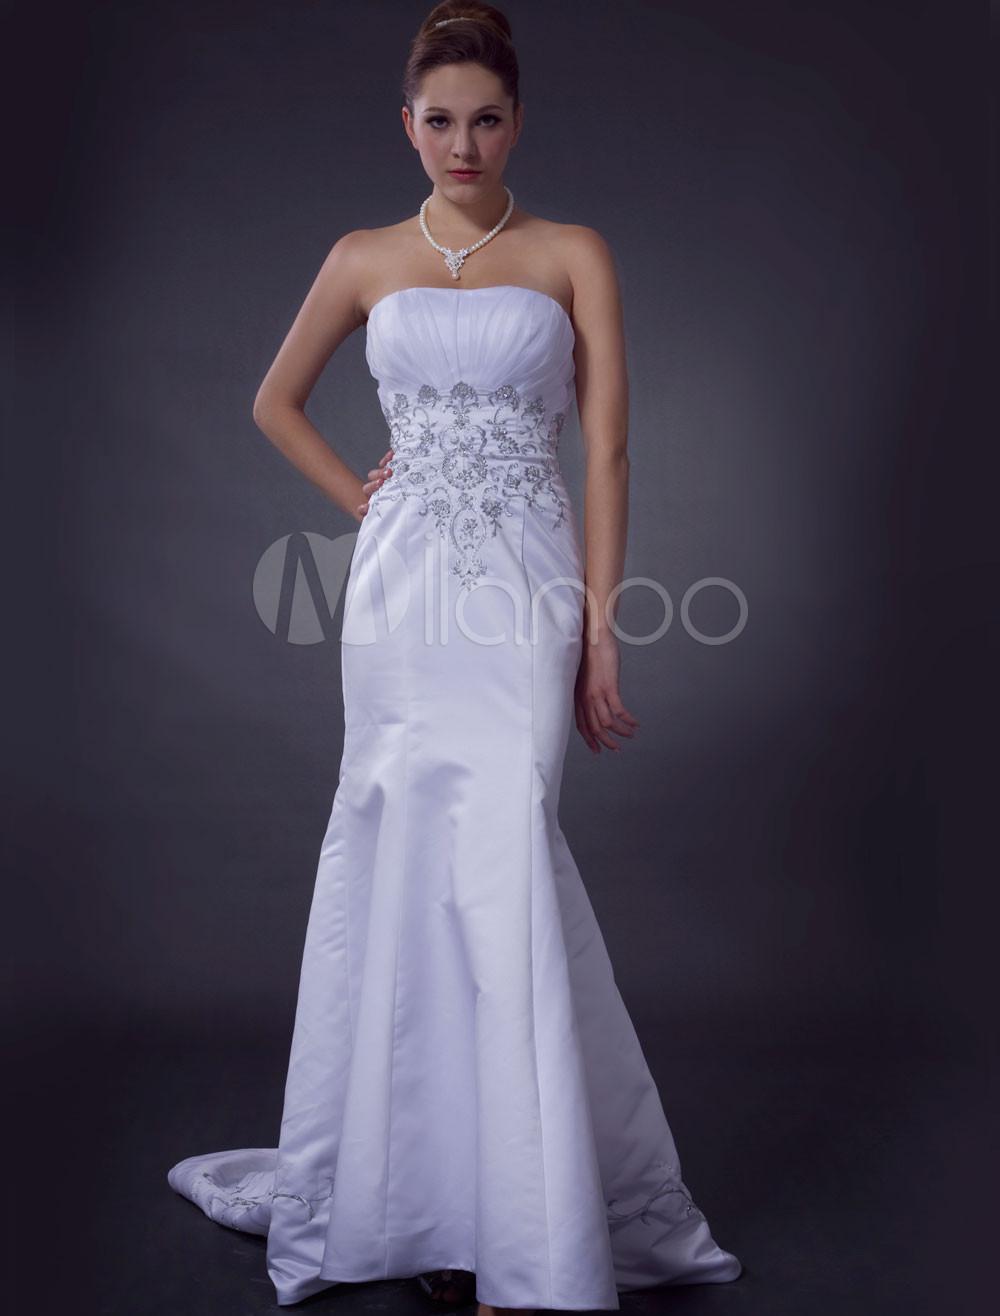 Elegant White Strapless Mermaid Trumpet Beading Embroidery Satin Wedding Dress